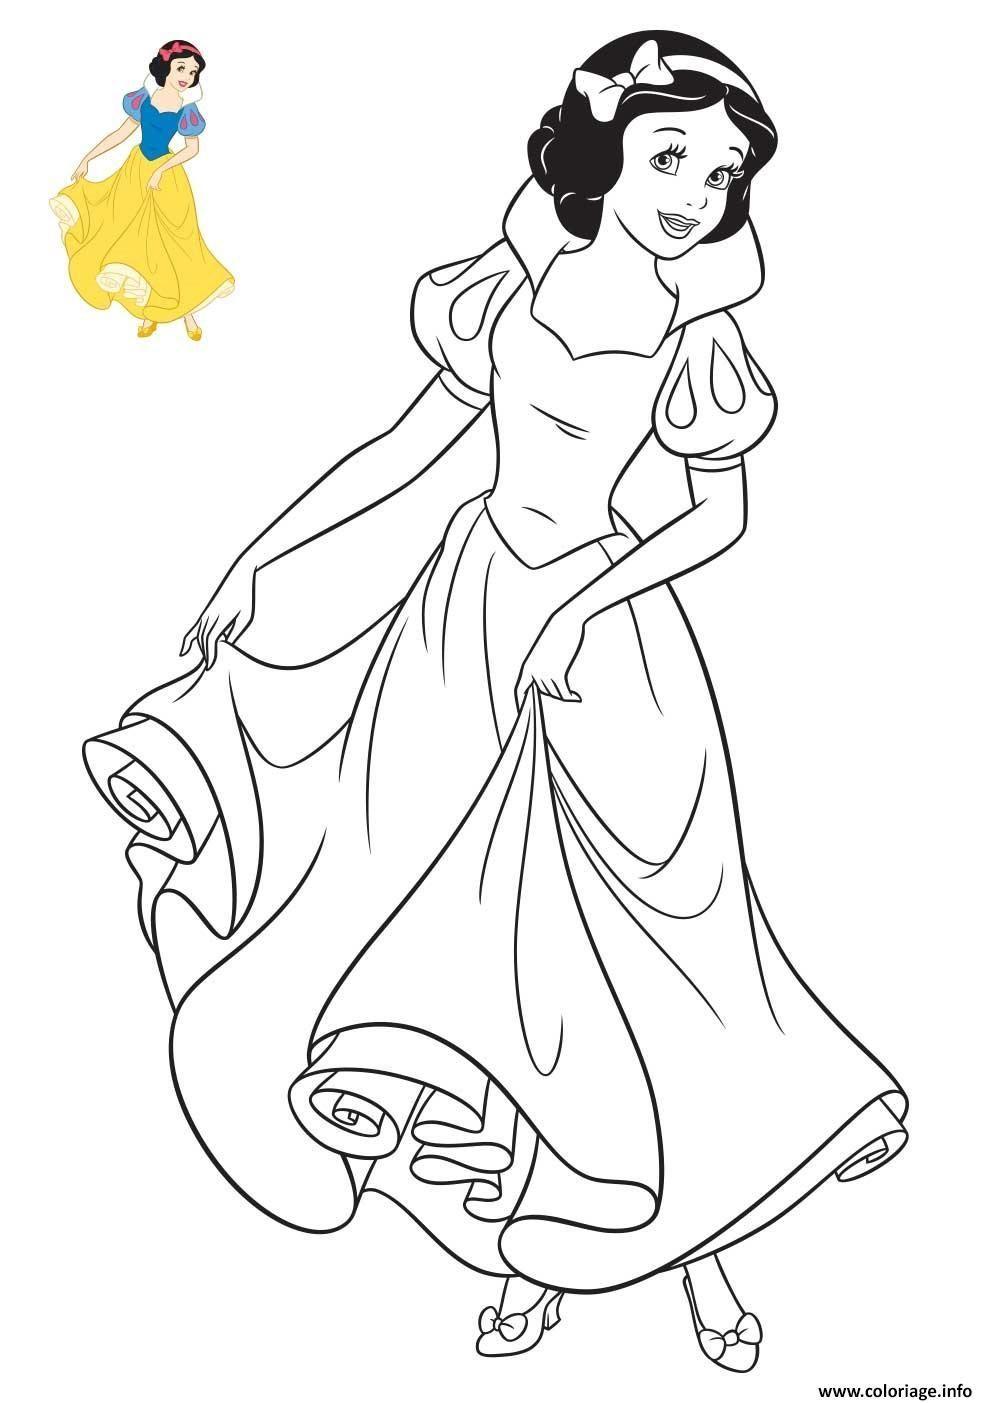 Princesse Disney Blanche Neige Coloriage Dessin  Coloriage dedans